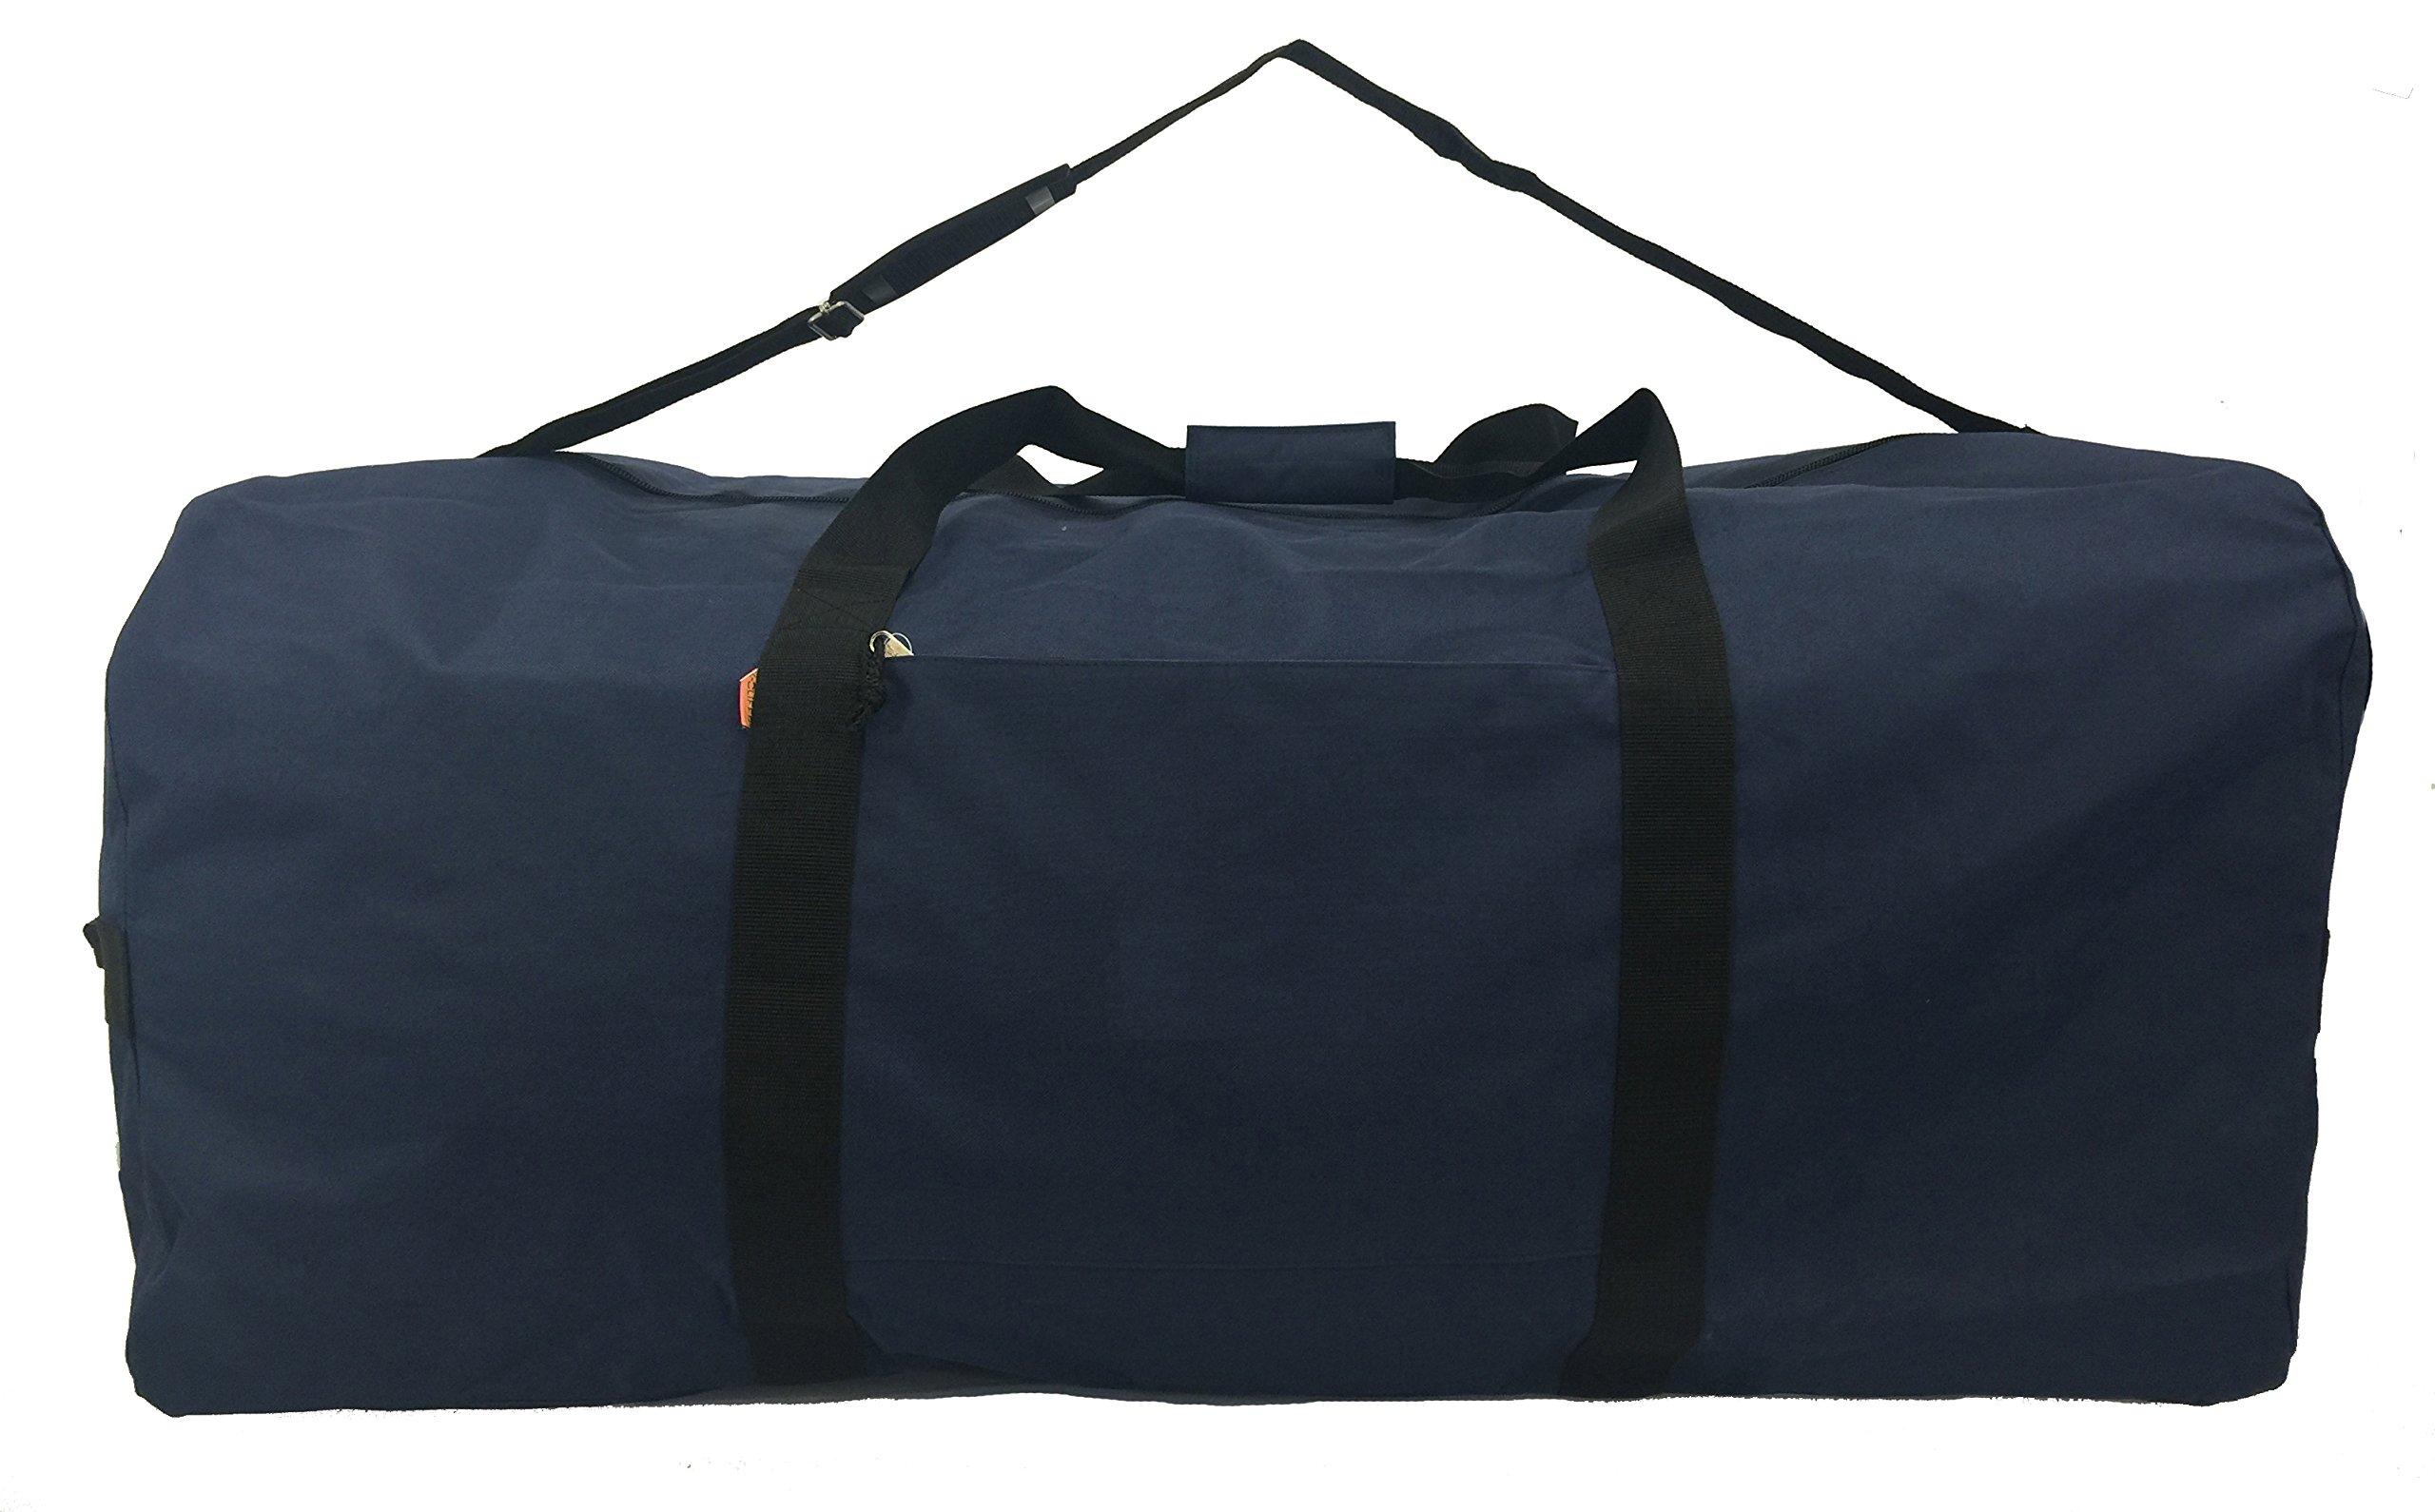 Heavy Duty Cargo Duffel Gear Bag Equipment Bags Square Sport Duffel Travel Bags 30 Inch Navy